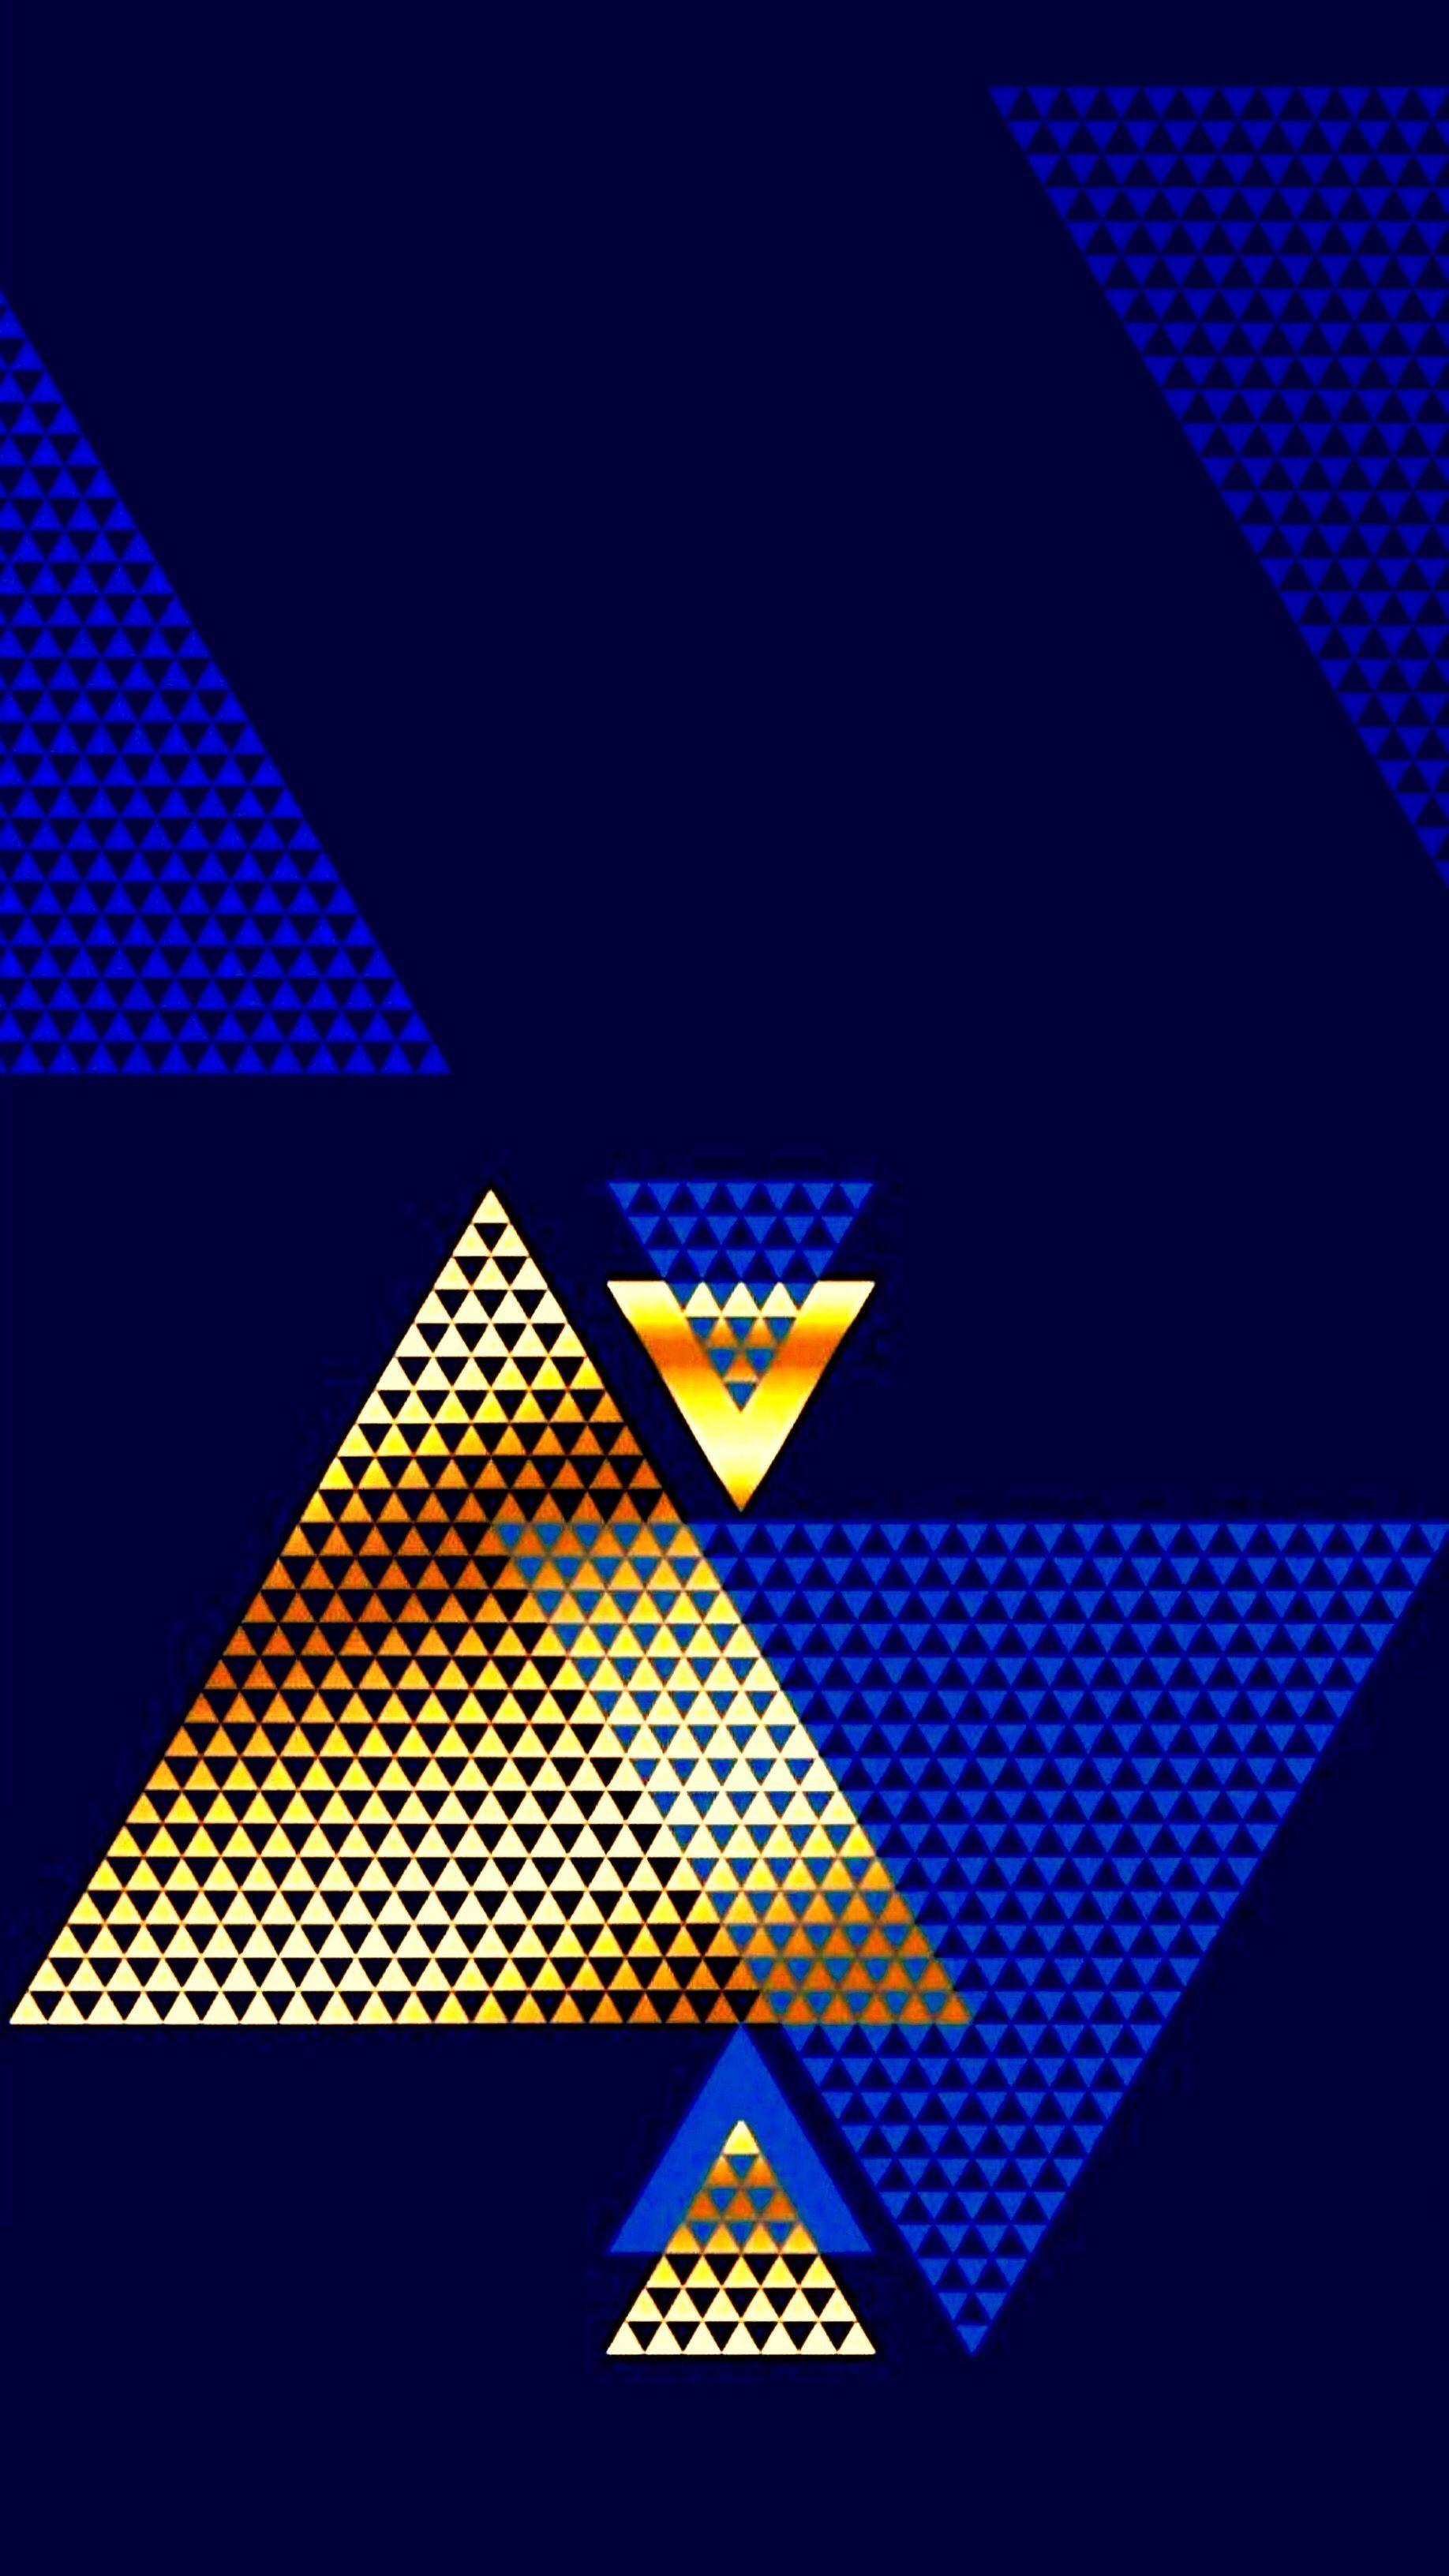 Pin By Kyekye Kay On Cellphone Wallpaper Bling Wallpaper Phone Screen Wallpaper